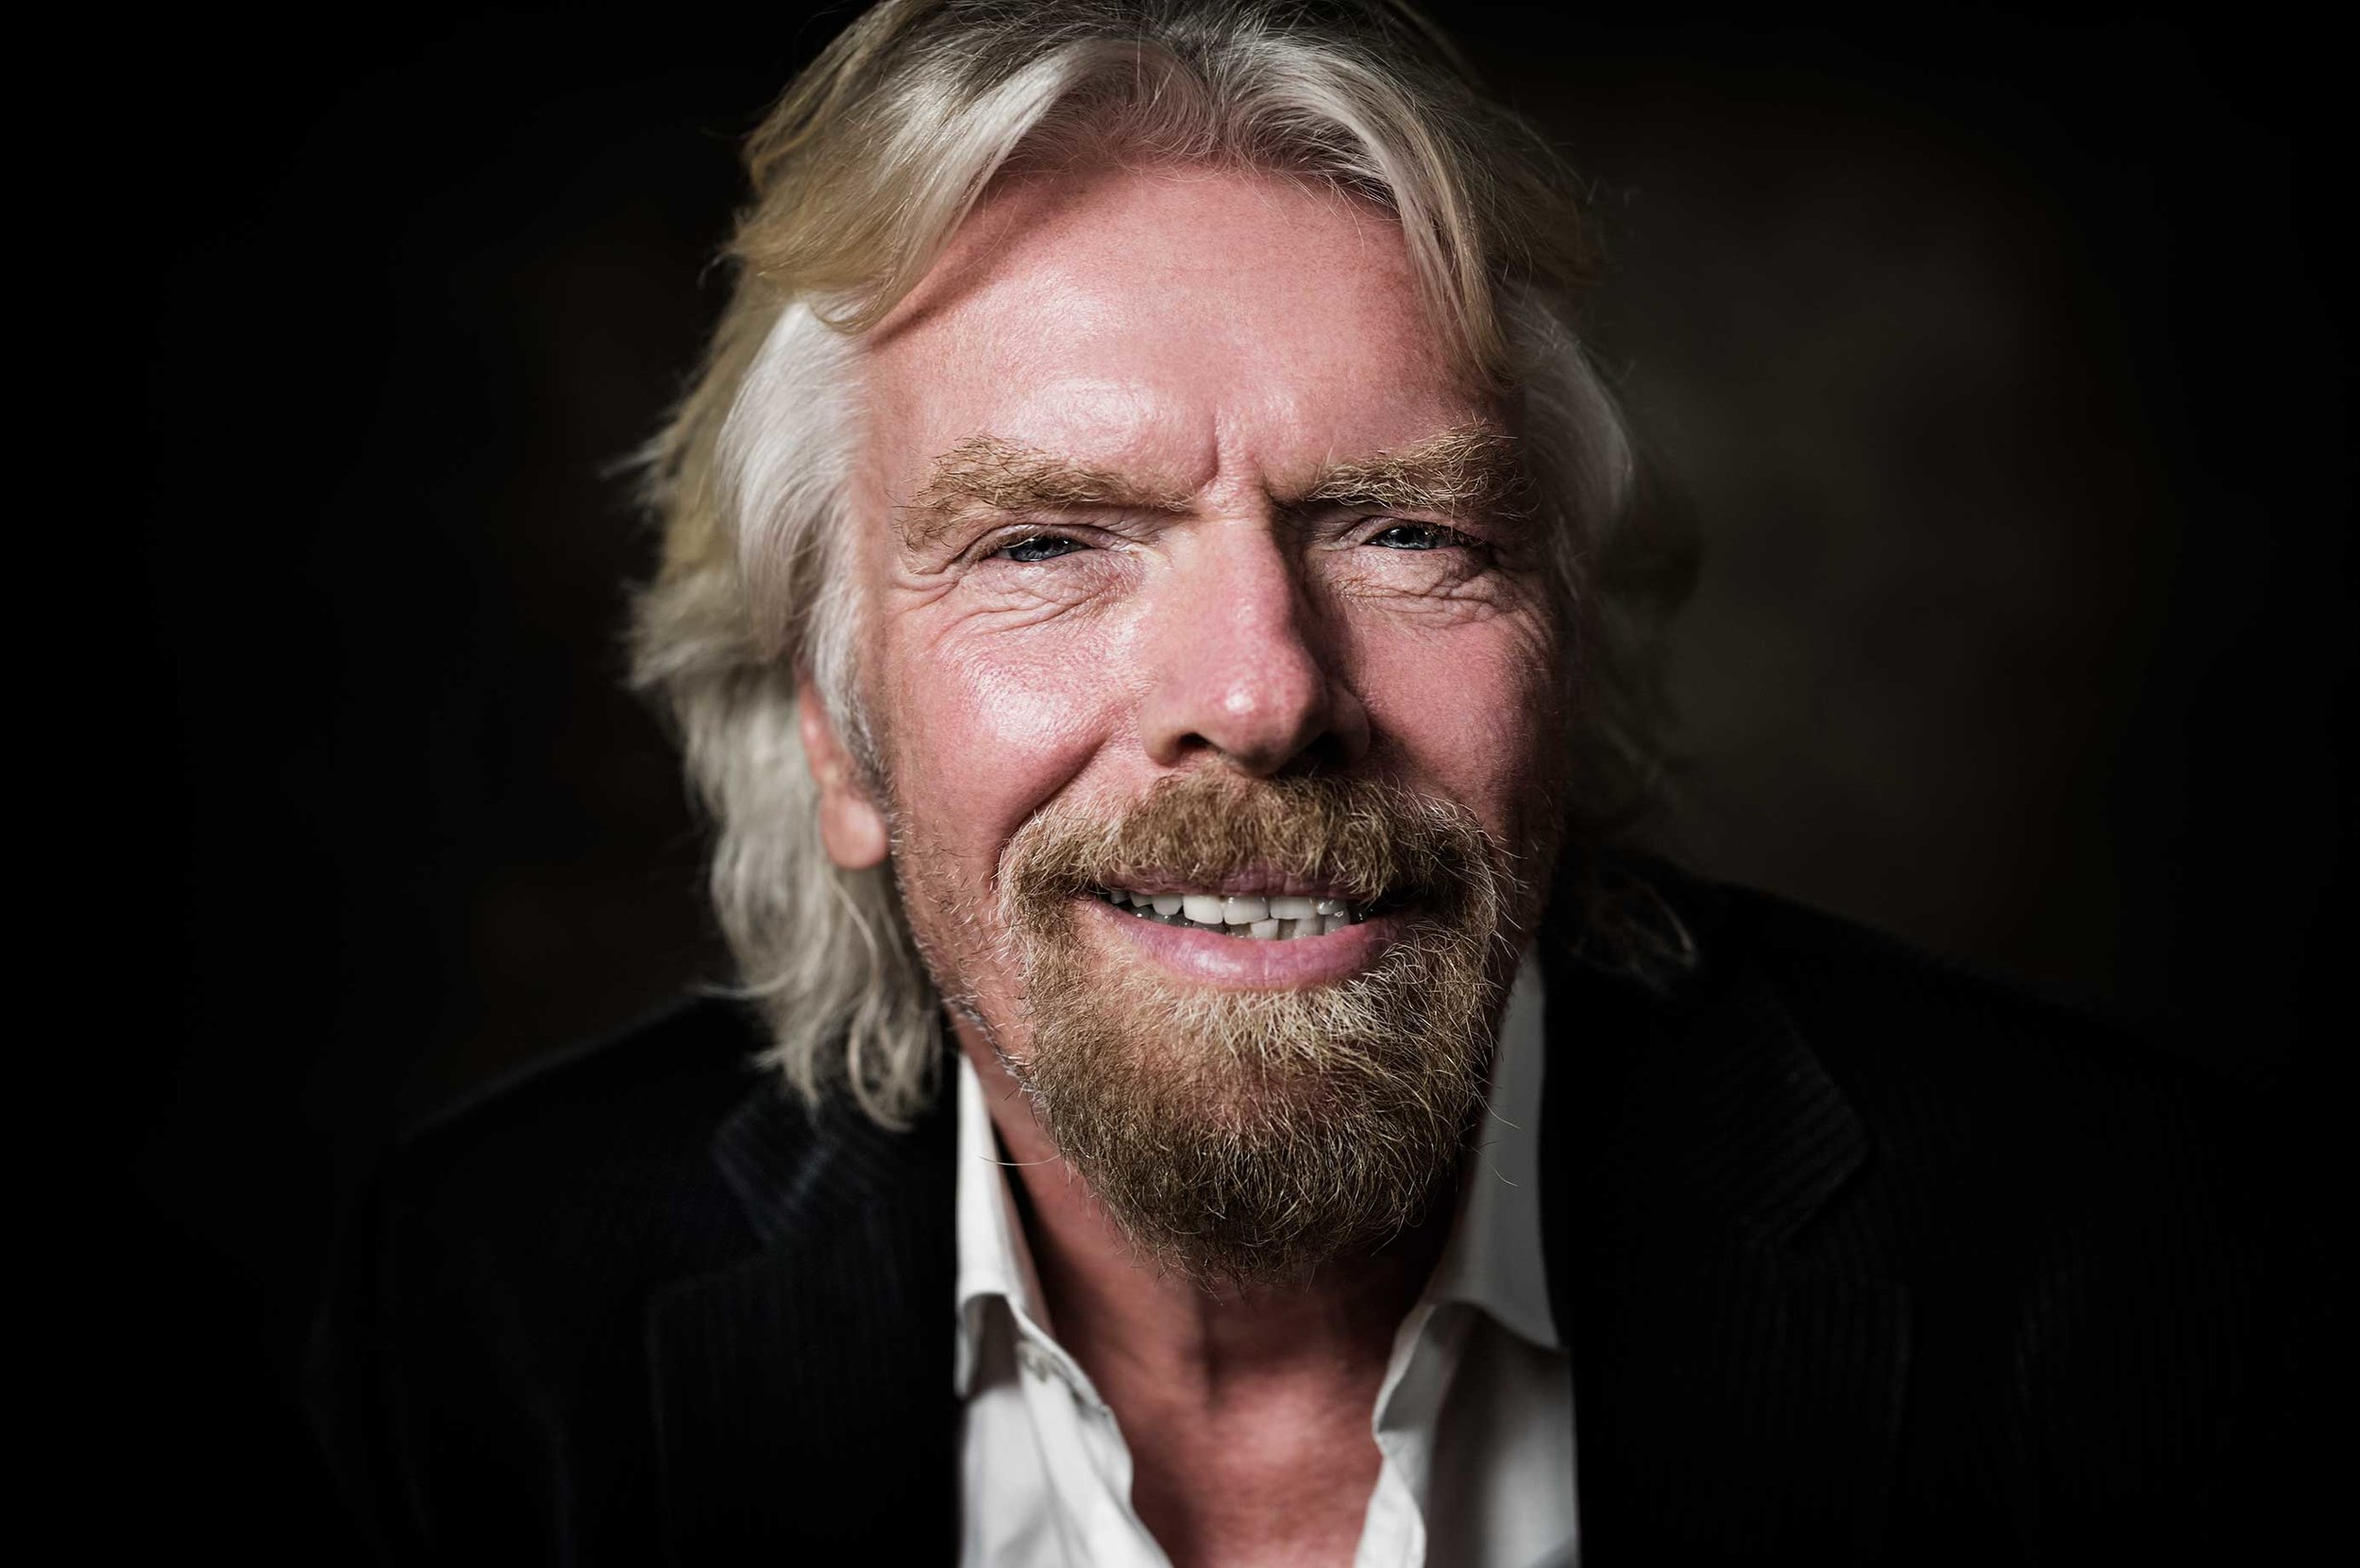 Richard-Branson---Dont-Look-Down-00089-1.jpg